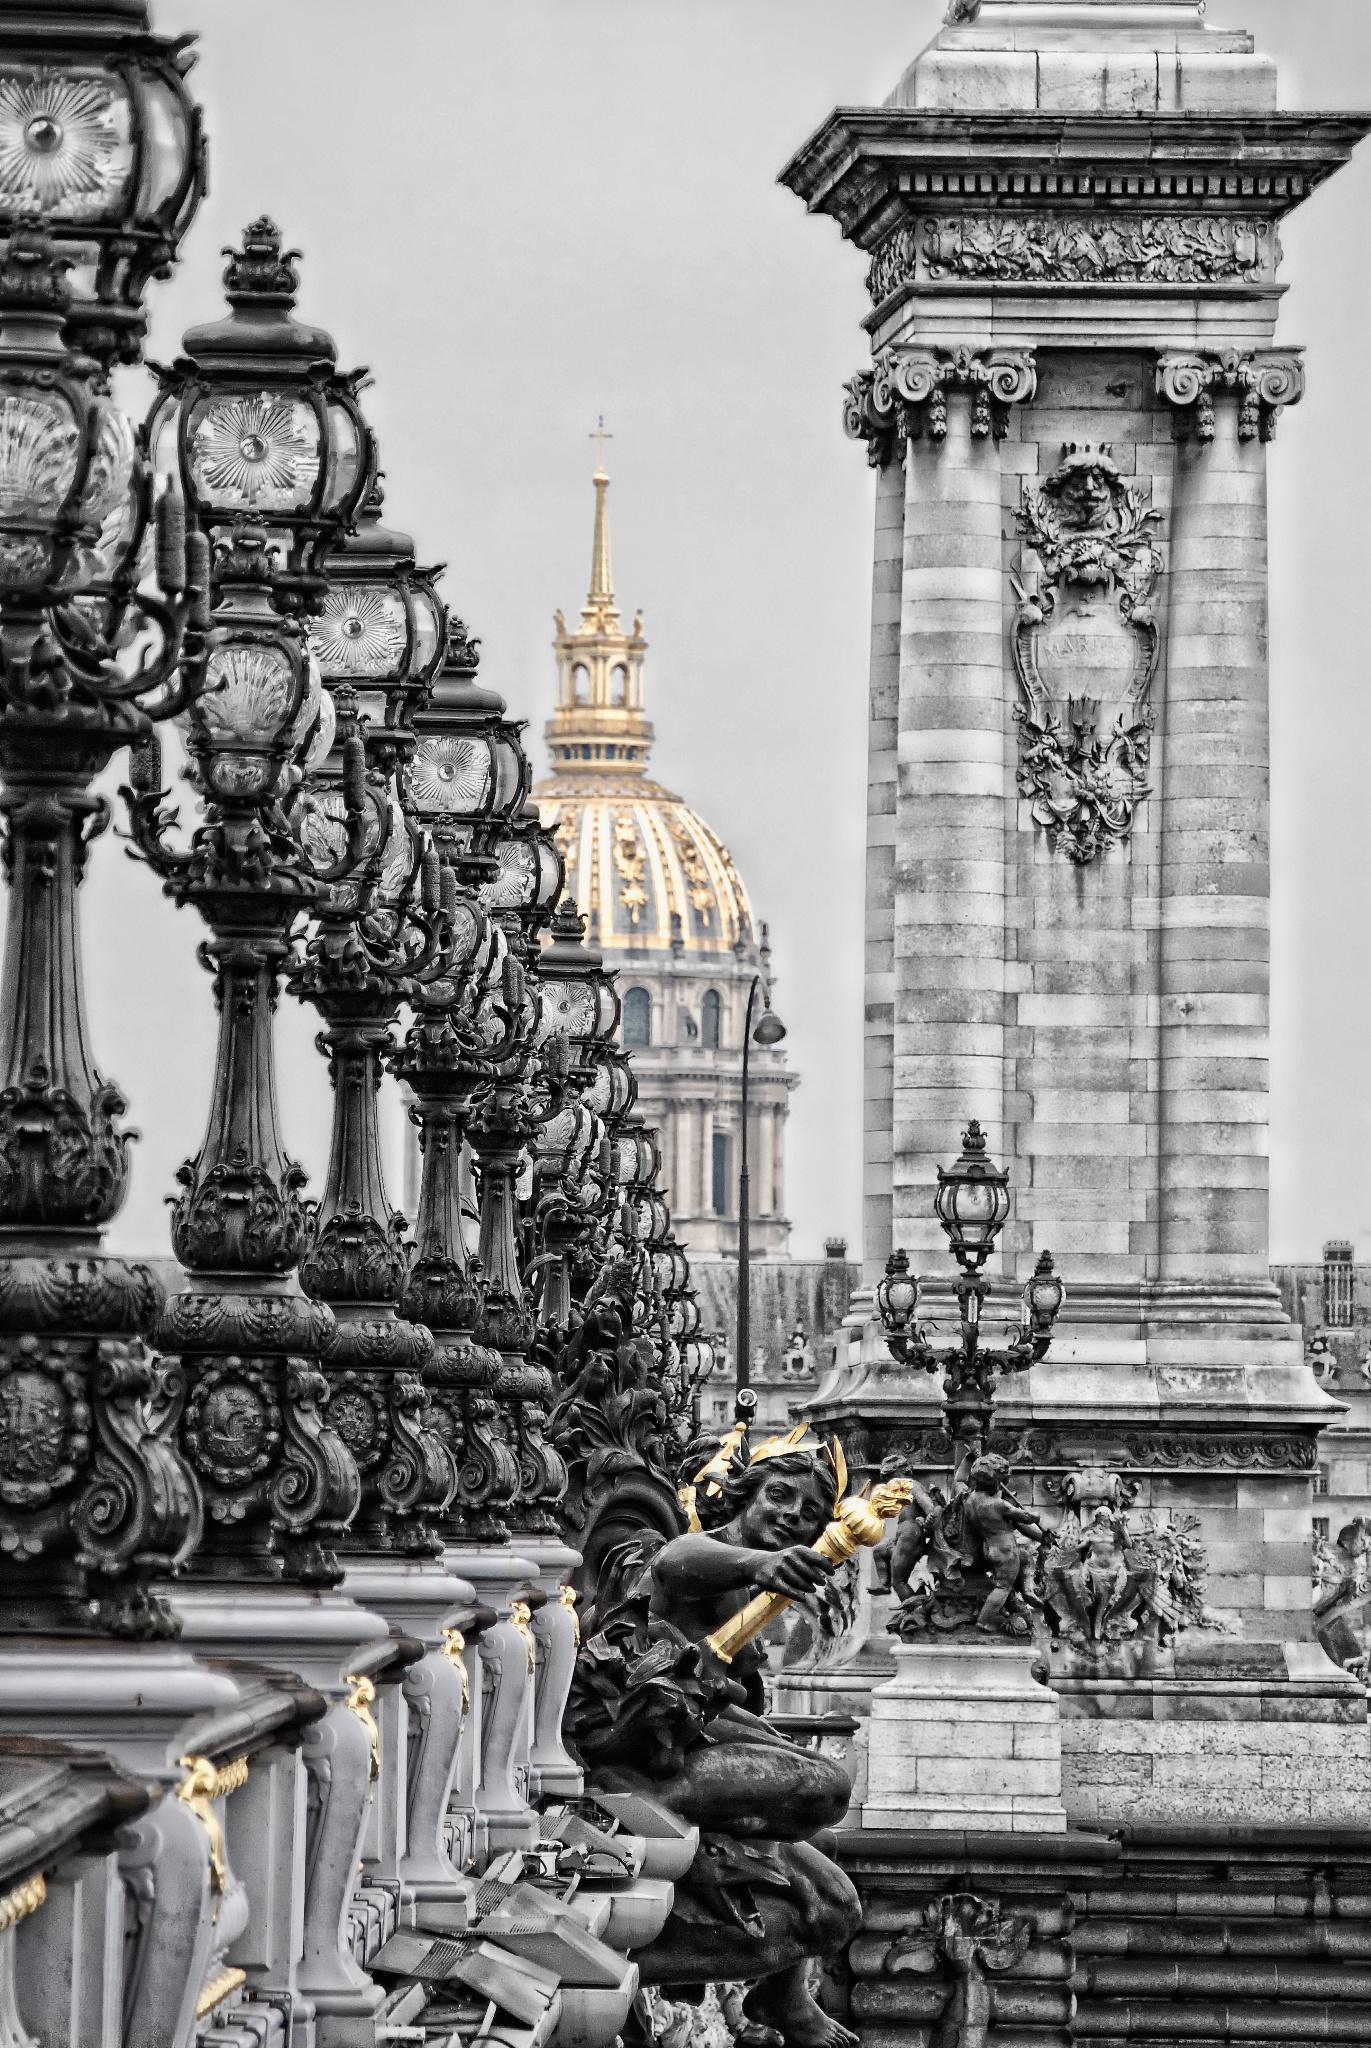 france architecture amazing photo wallpaper